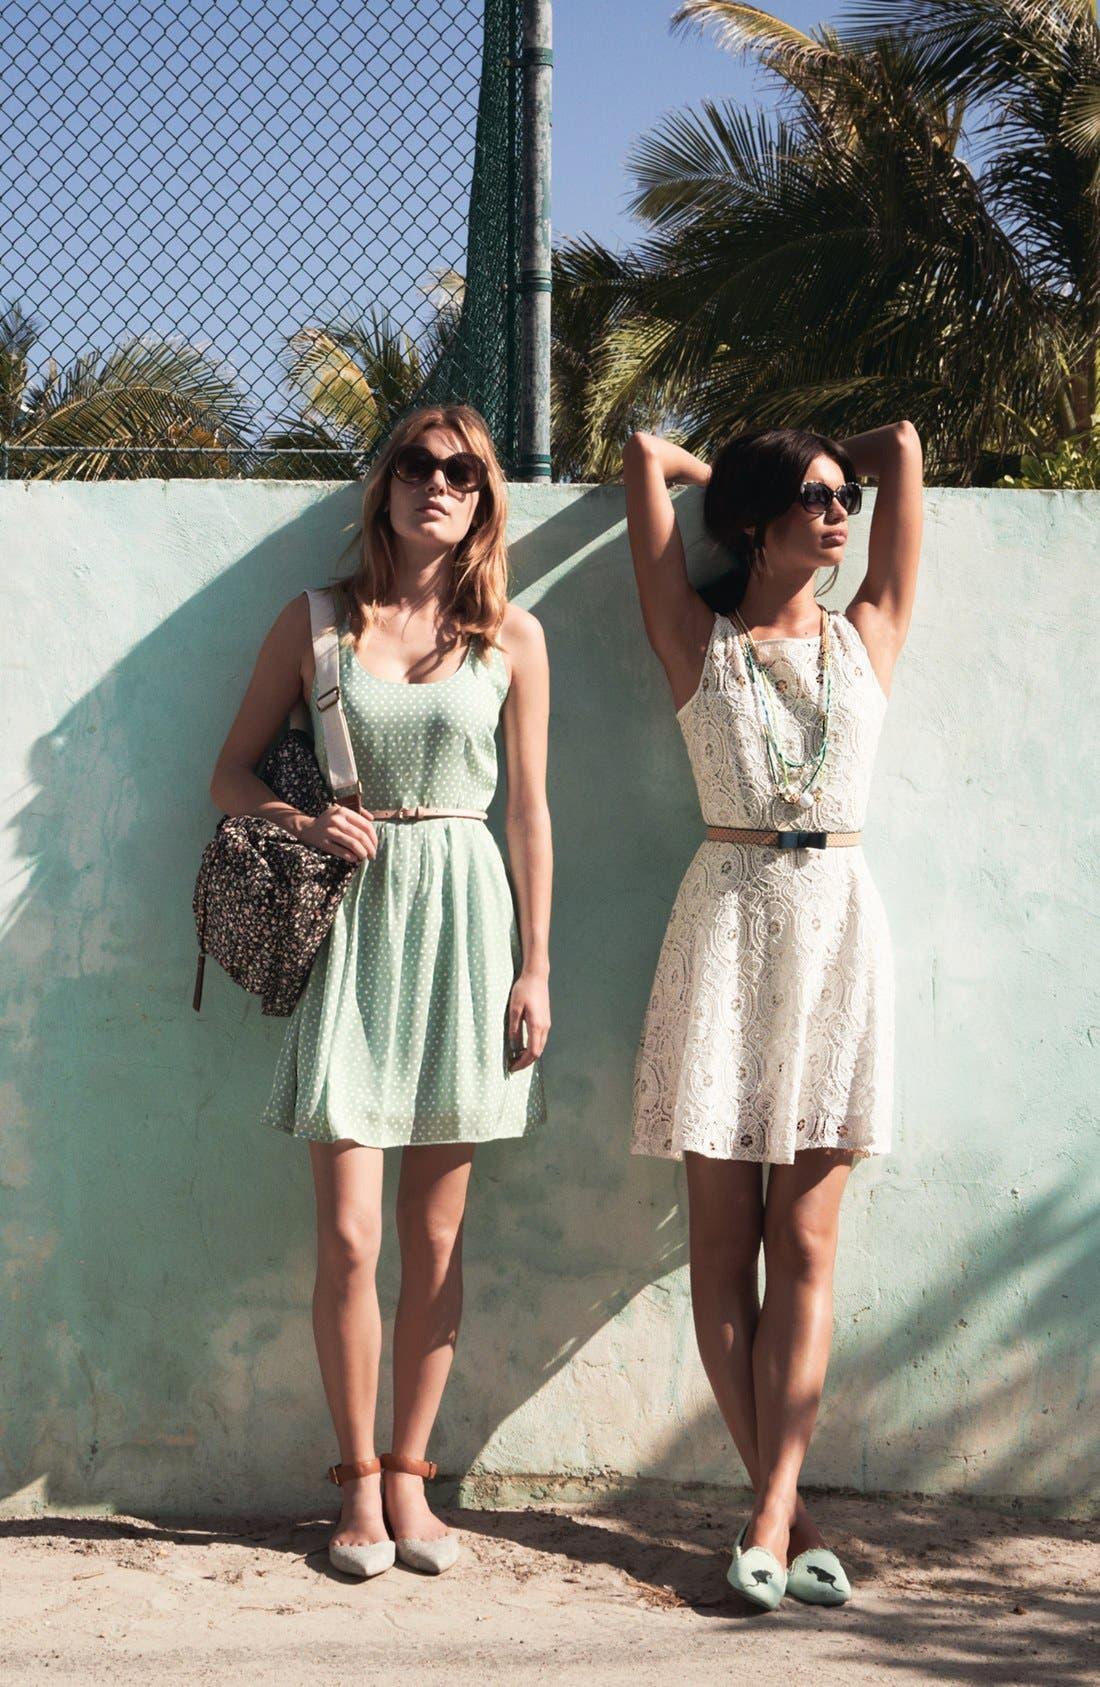 Alternate Image 1 Selected - BB Dakota Dress & Accessories